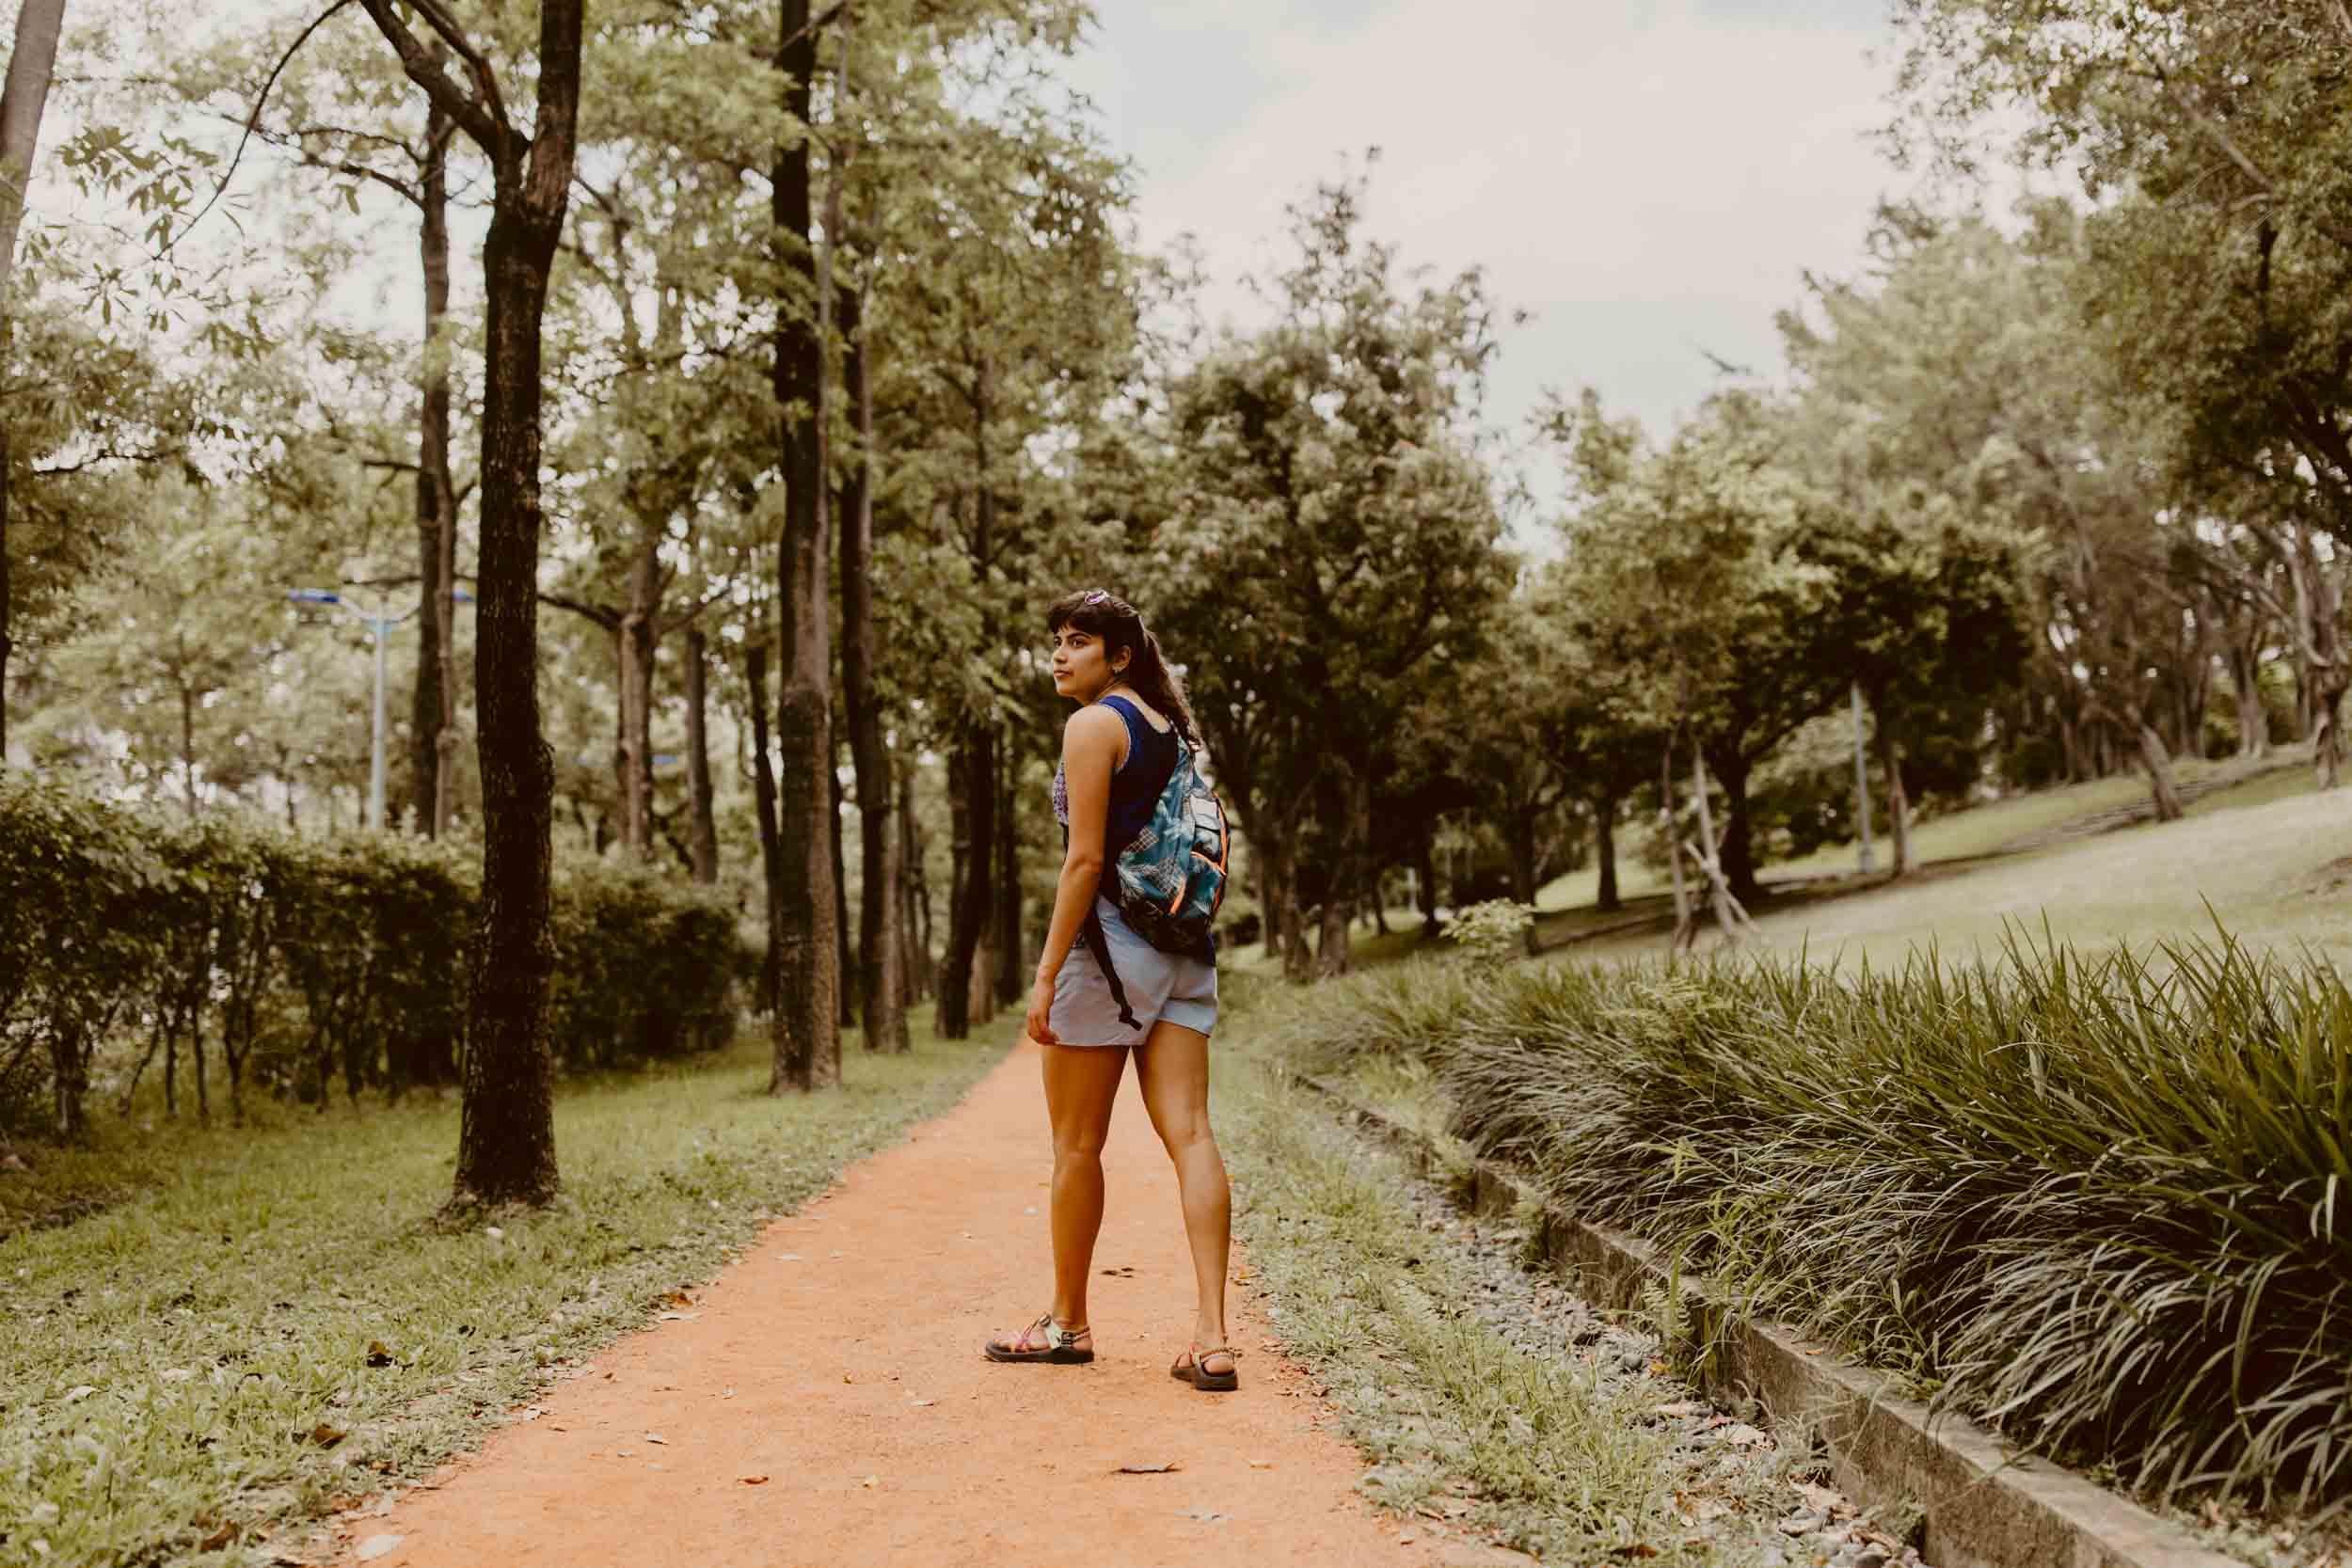 Miriam-Subbiah-taiwan-18.jpg